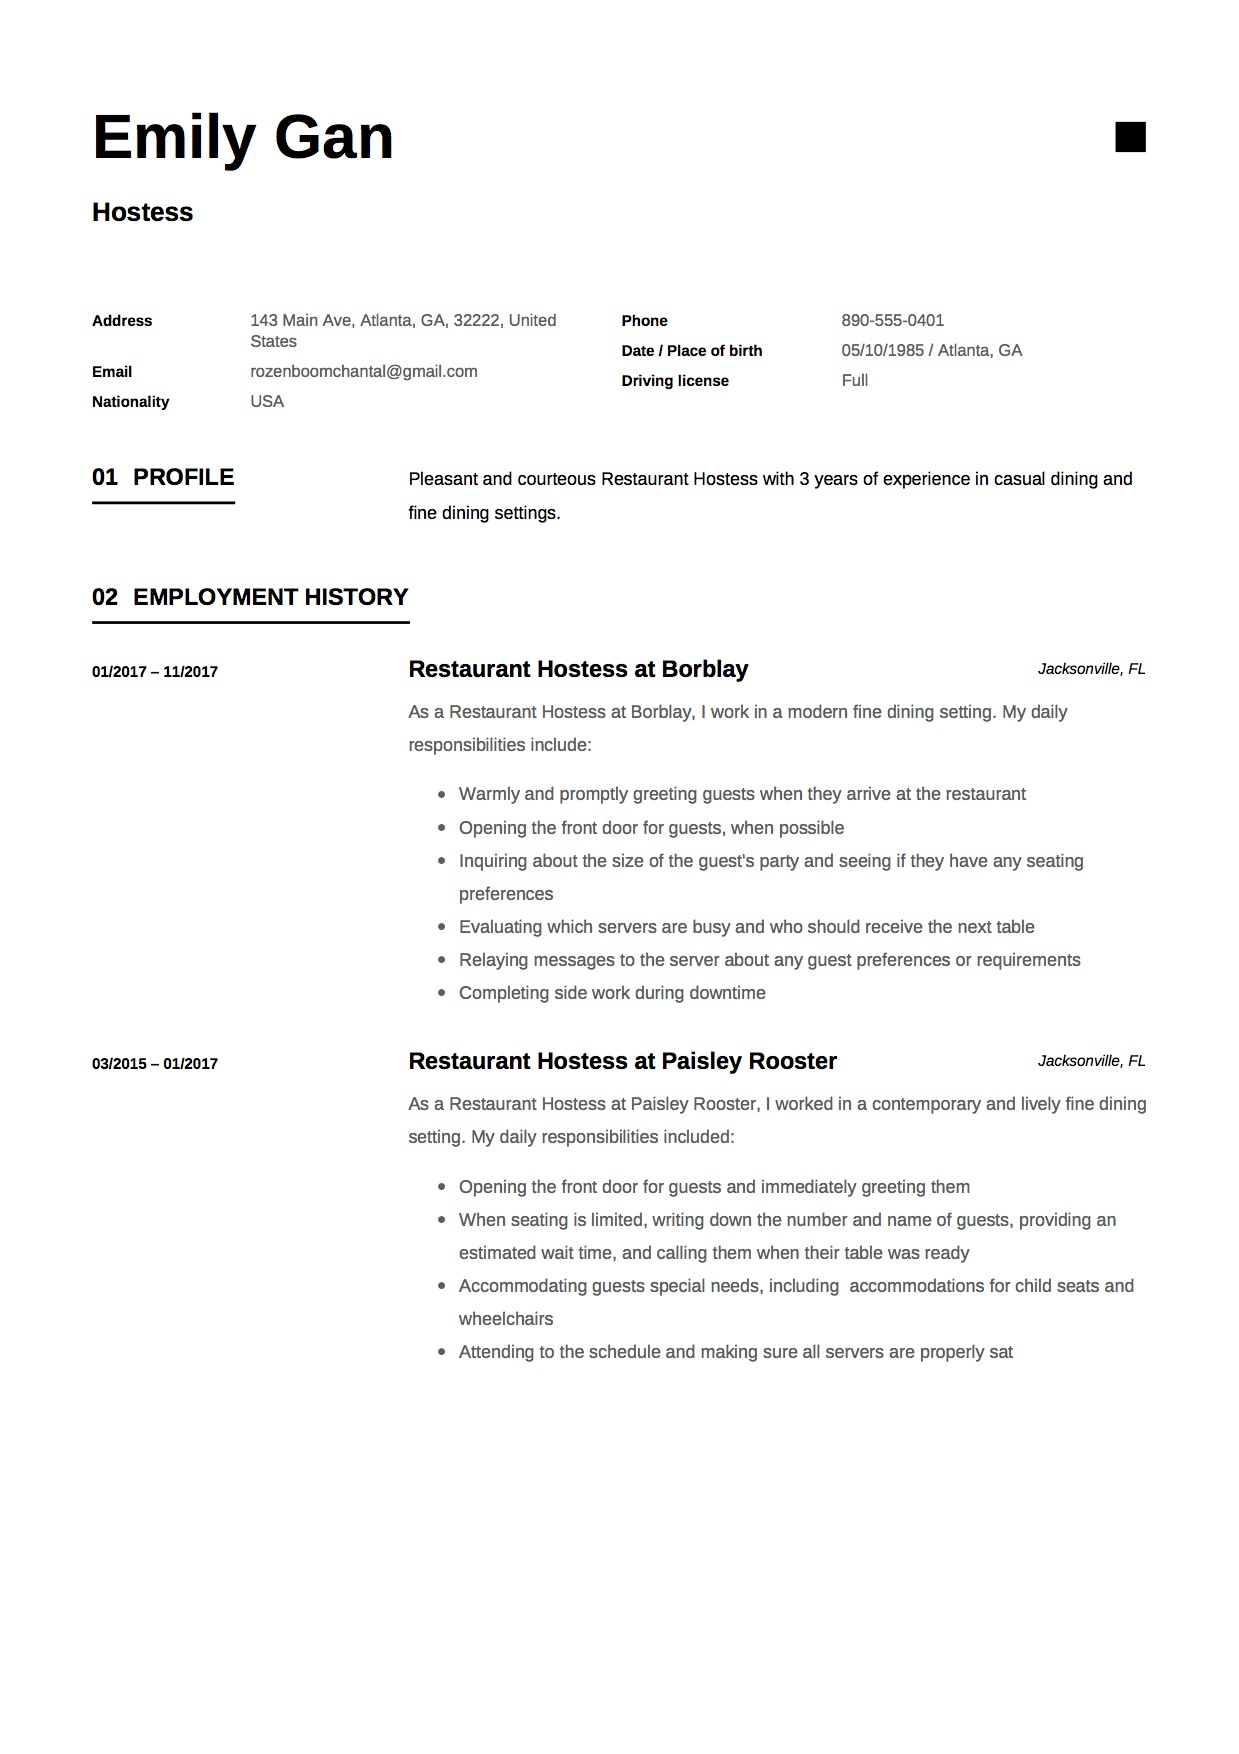 hostess description on resume